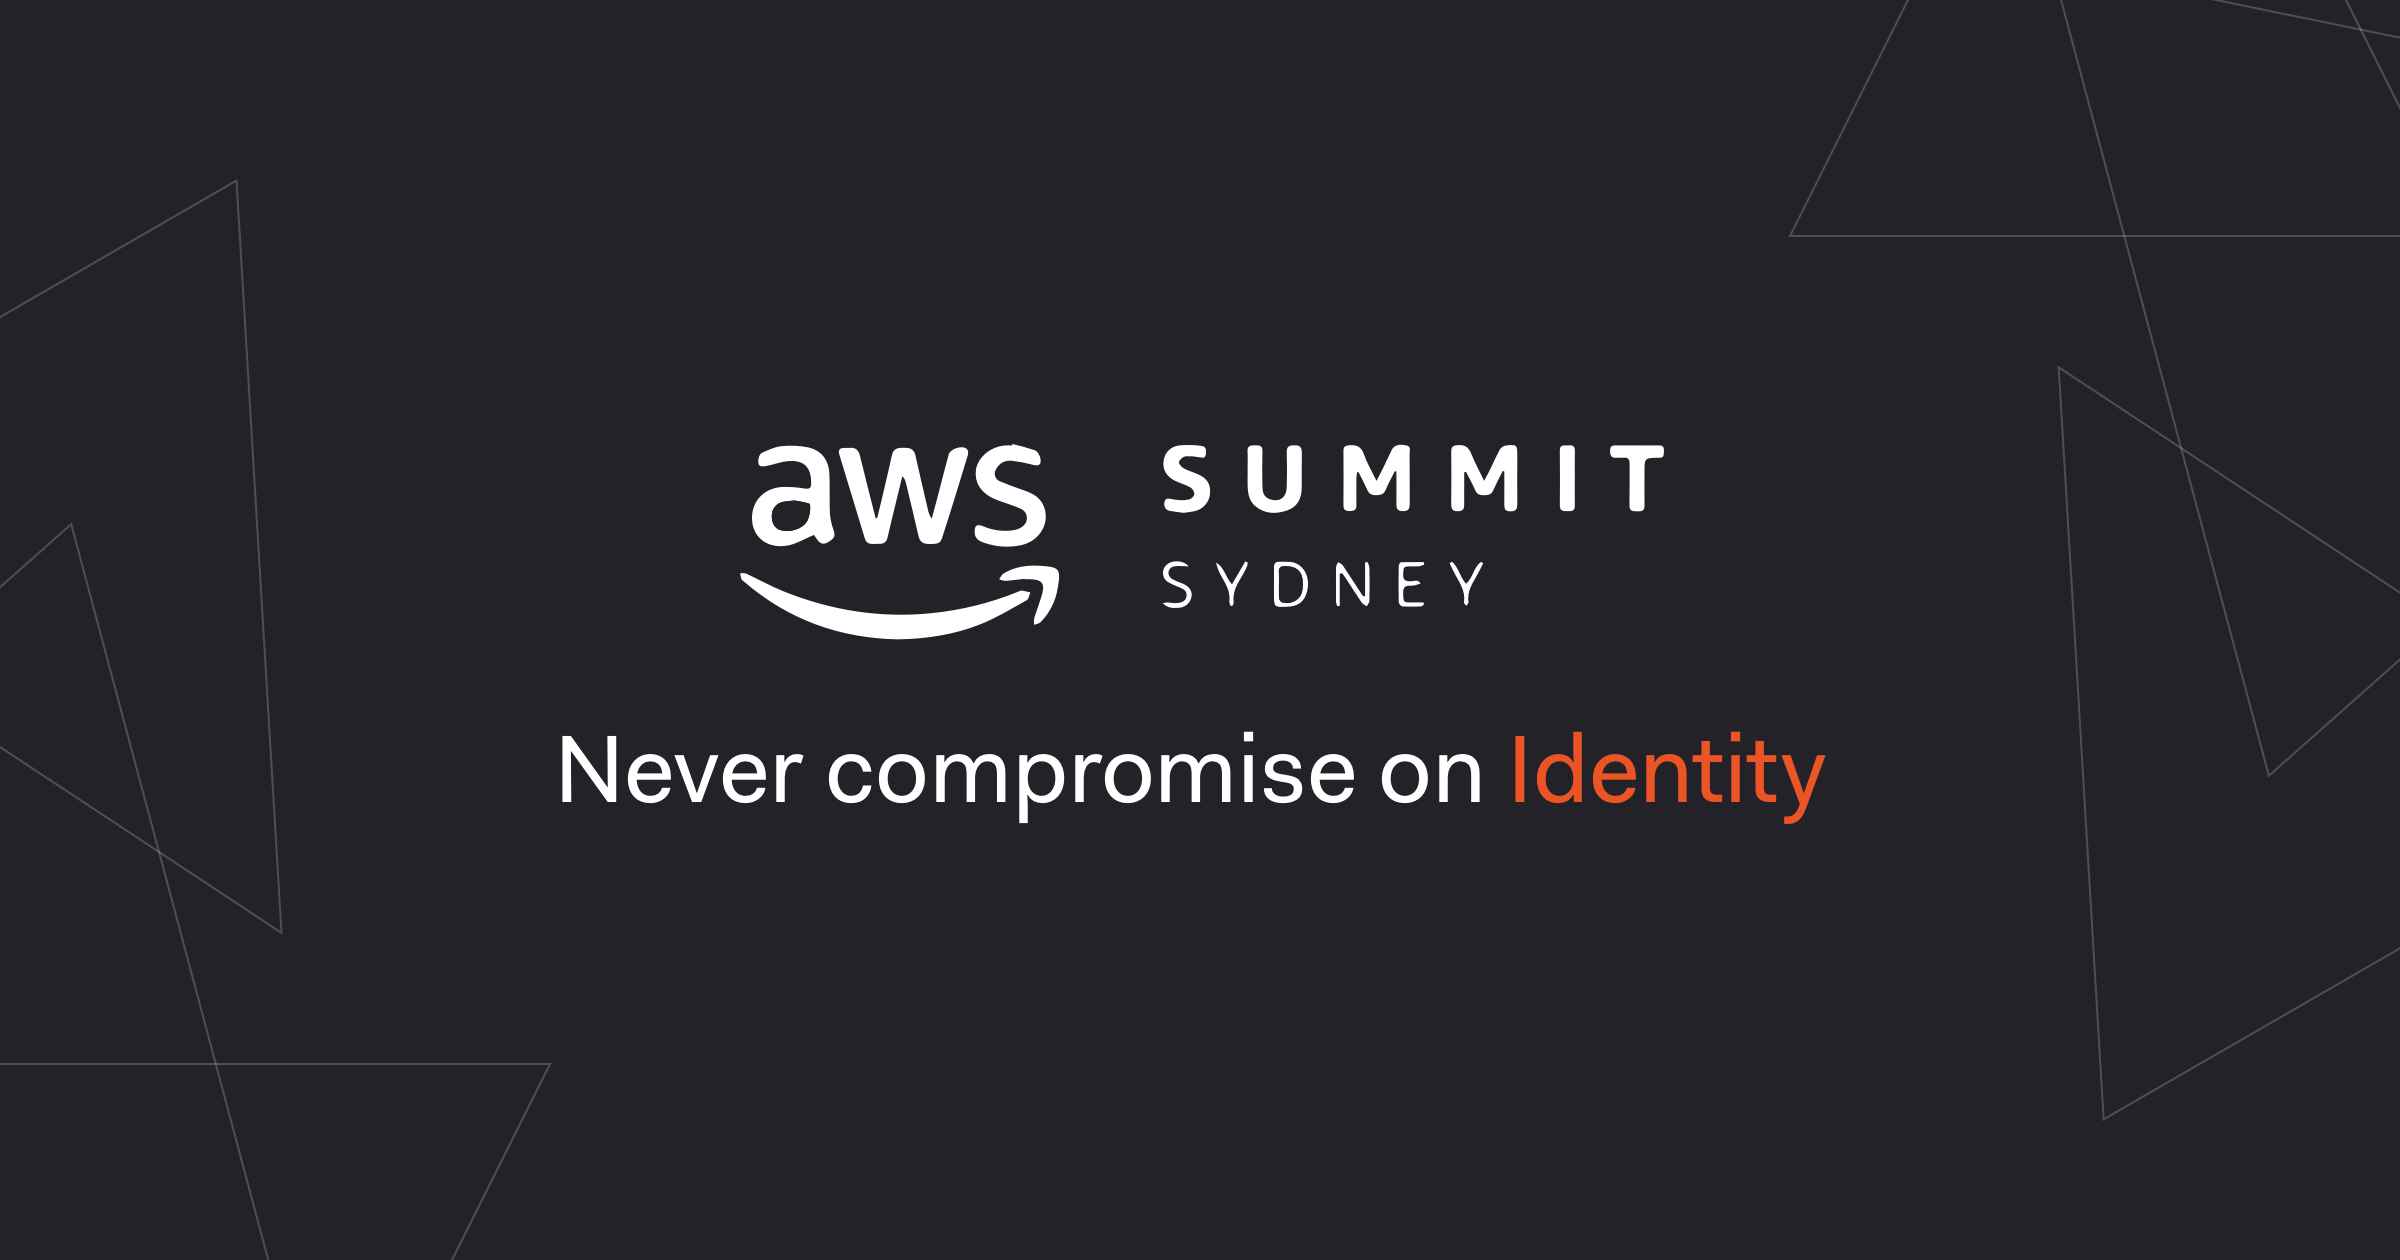 AWS Summit Sydney